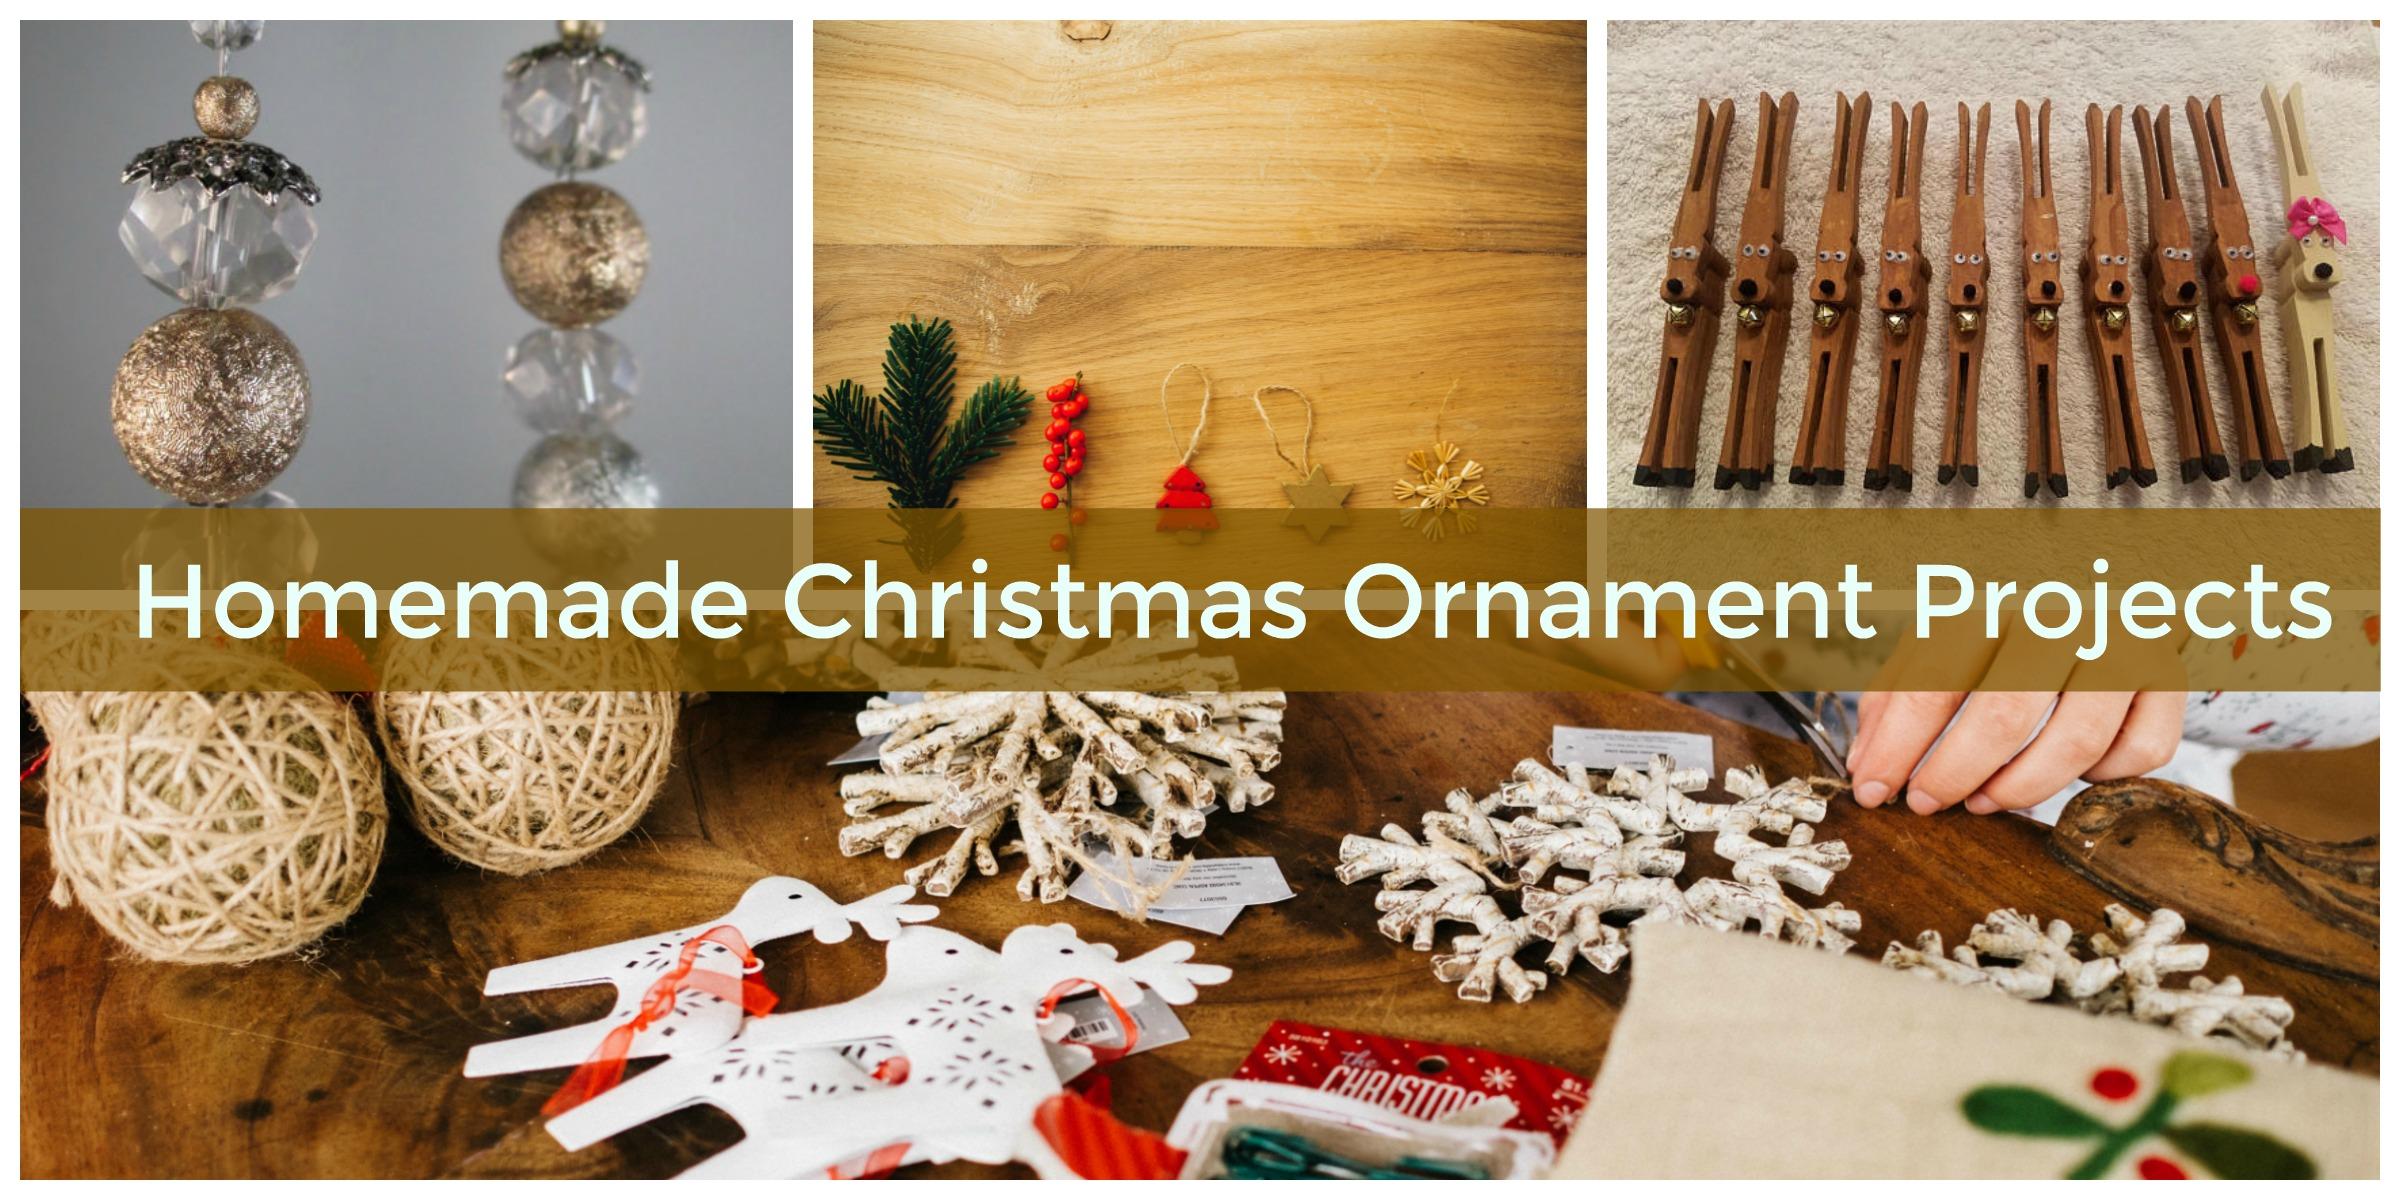 christmas crafting fun image courtesy unsplash user michael mroczek